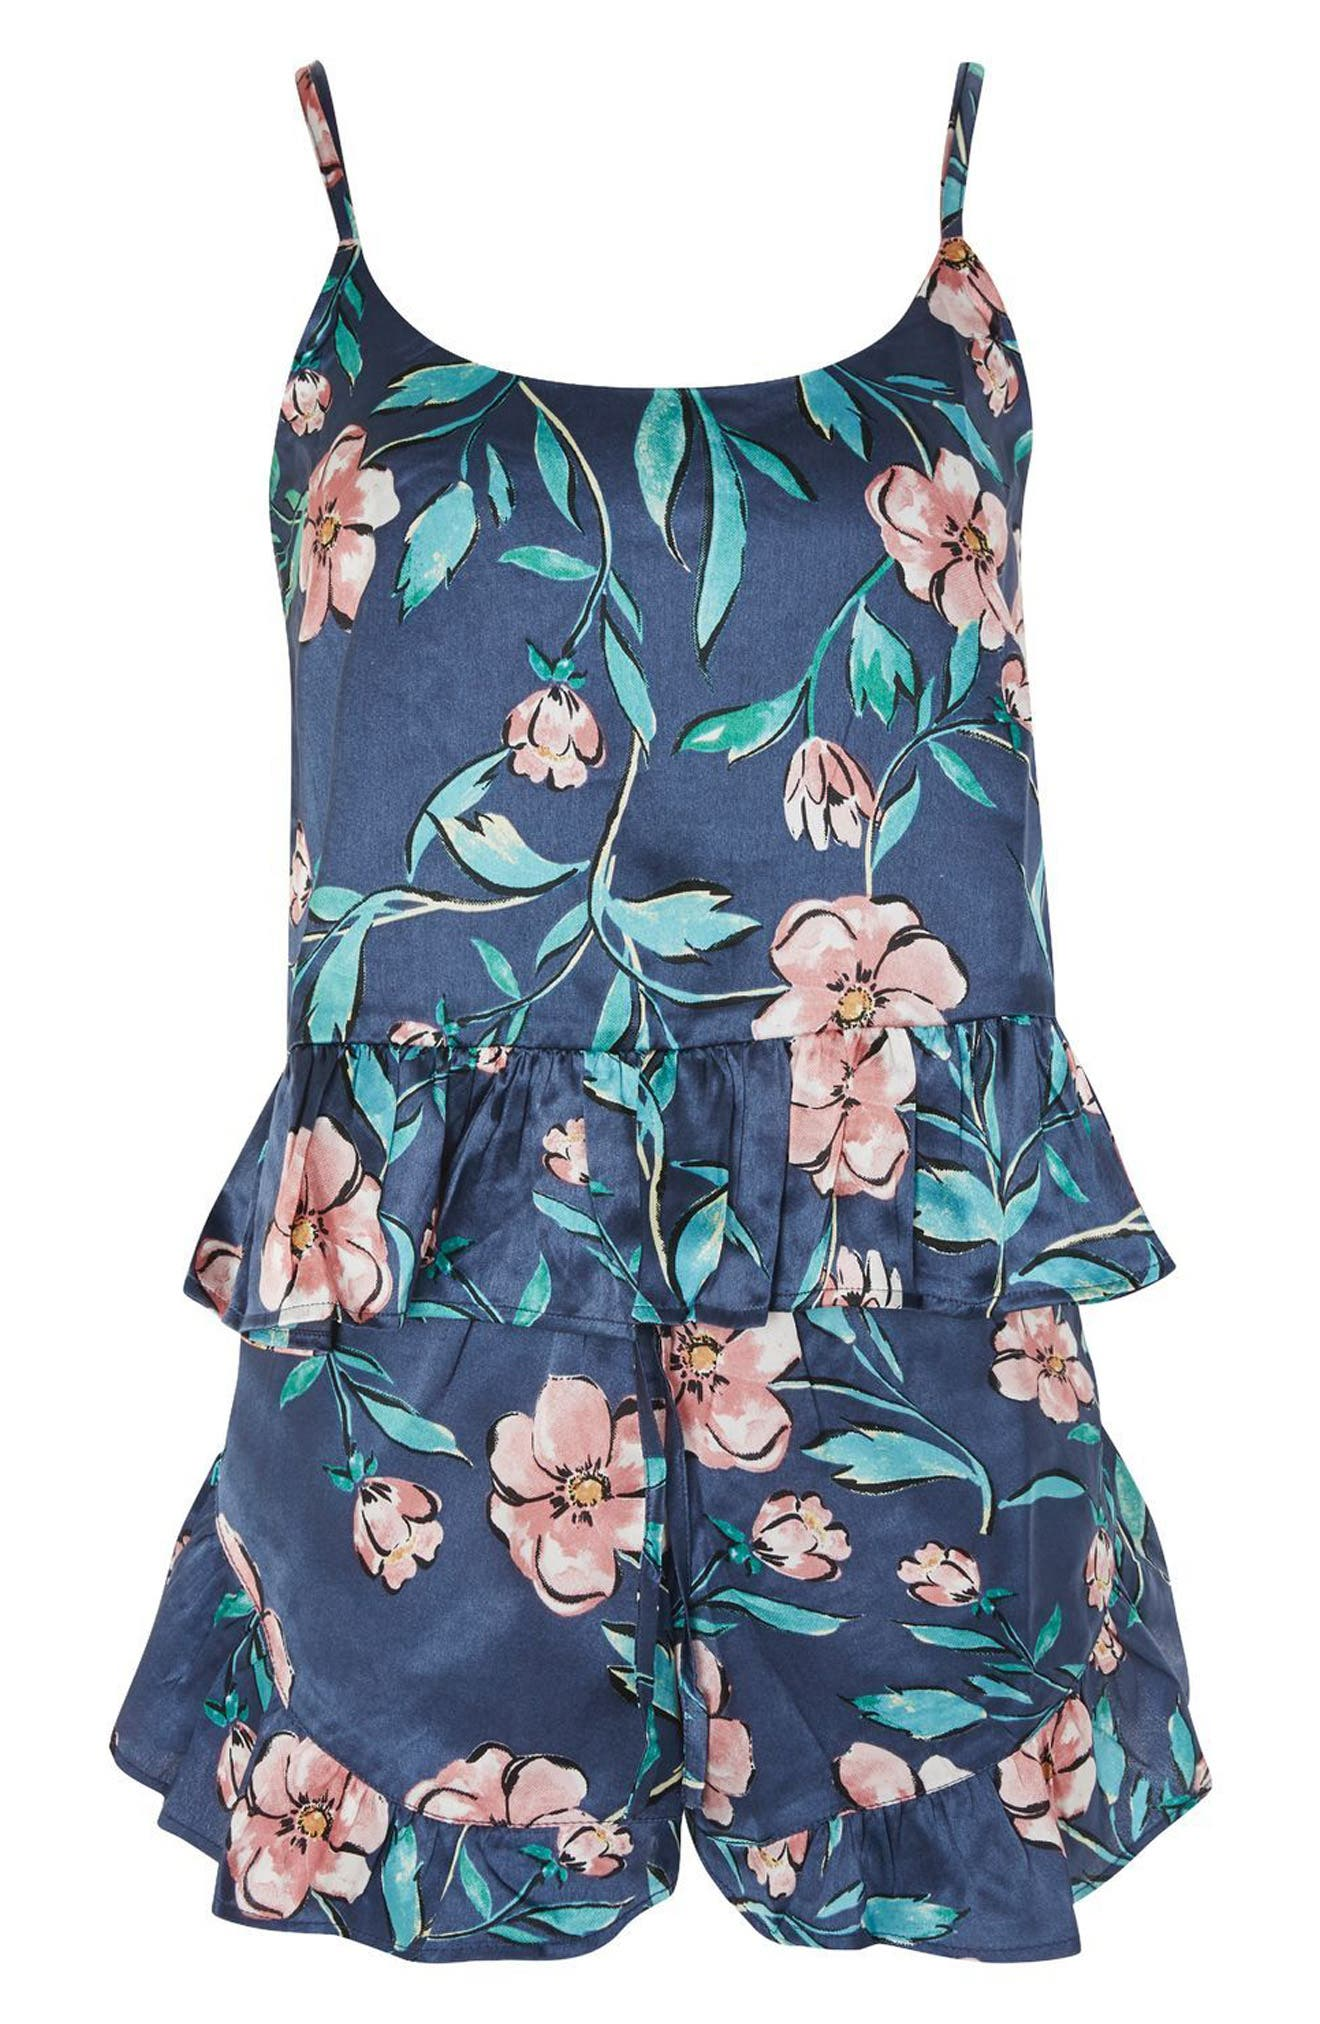 Peony Satin Short Pajamas,                             Alternate thumbnail 3, color,                             Navy Blue Multi